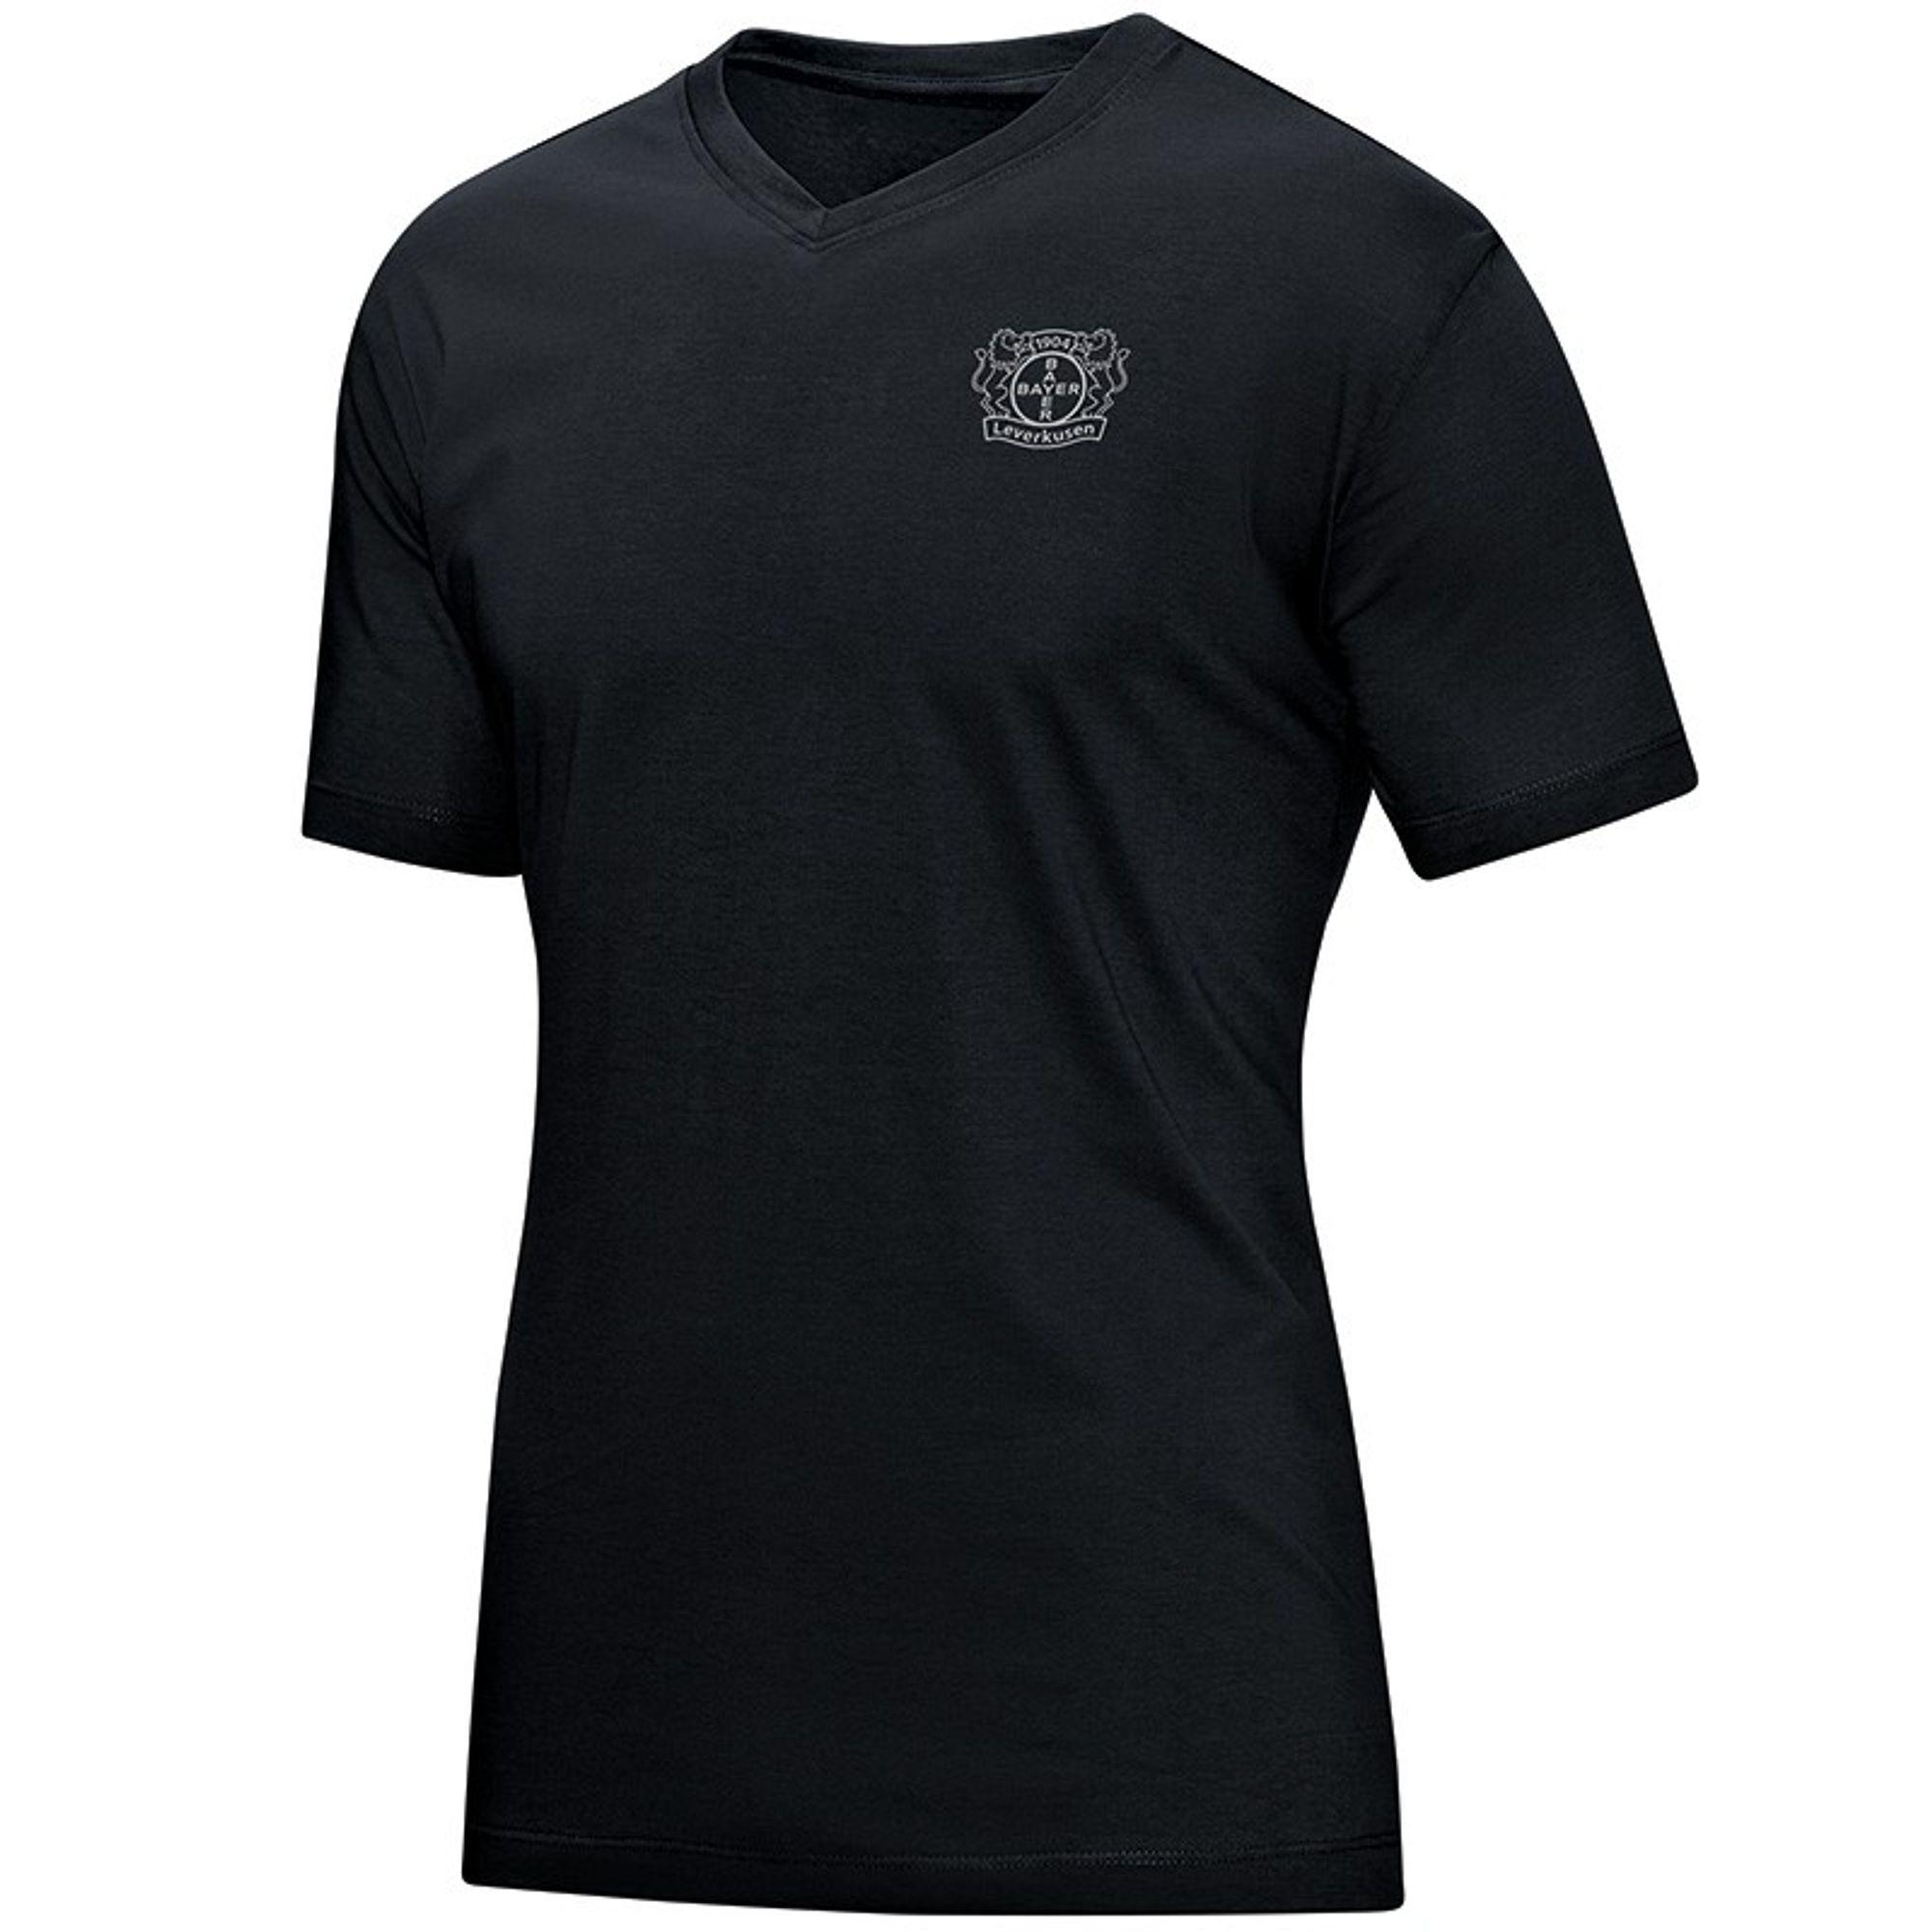 Jako Bayer 04 Leverkusen T- Shirt Premium - schwarz